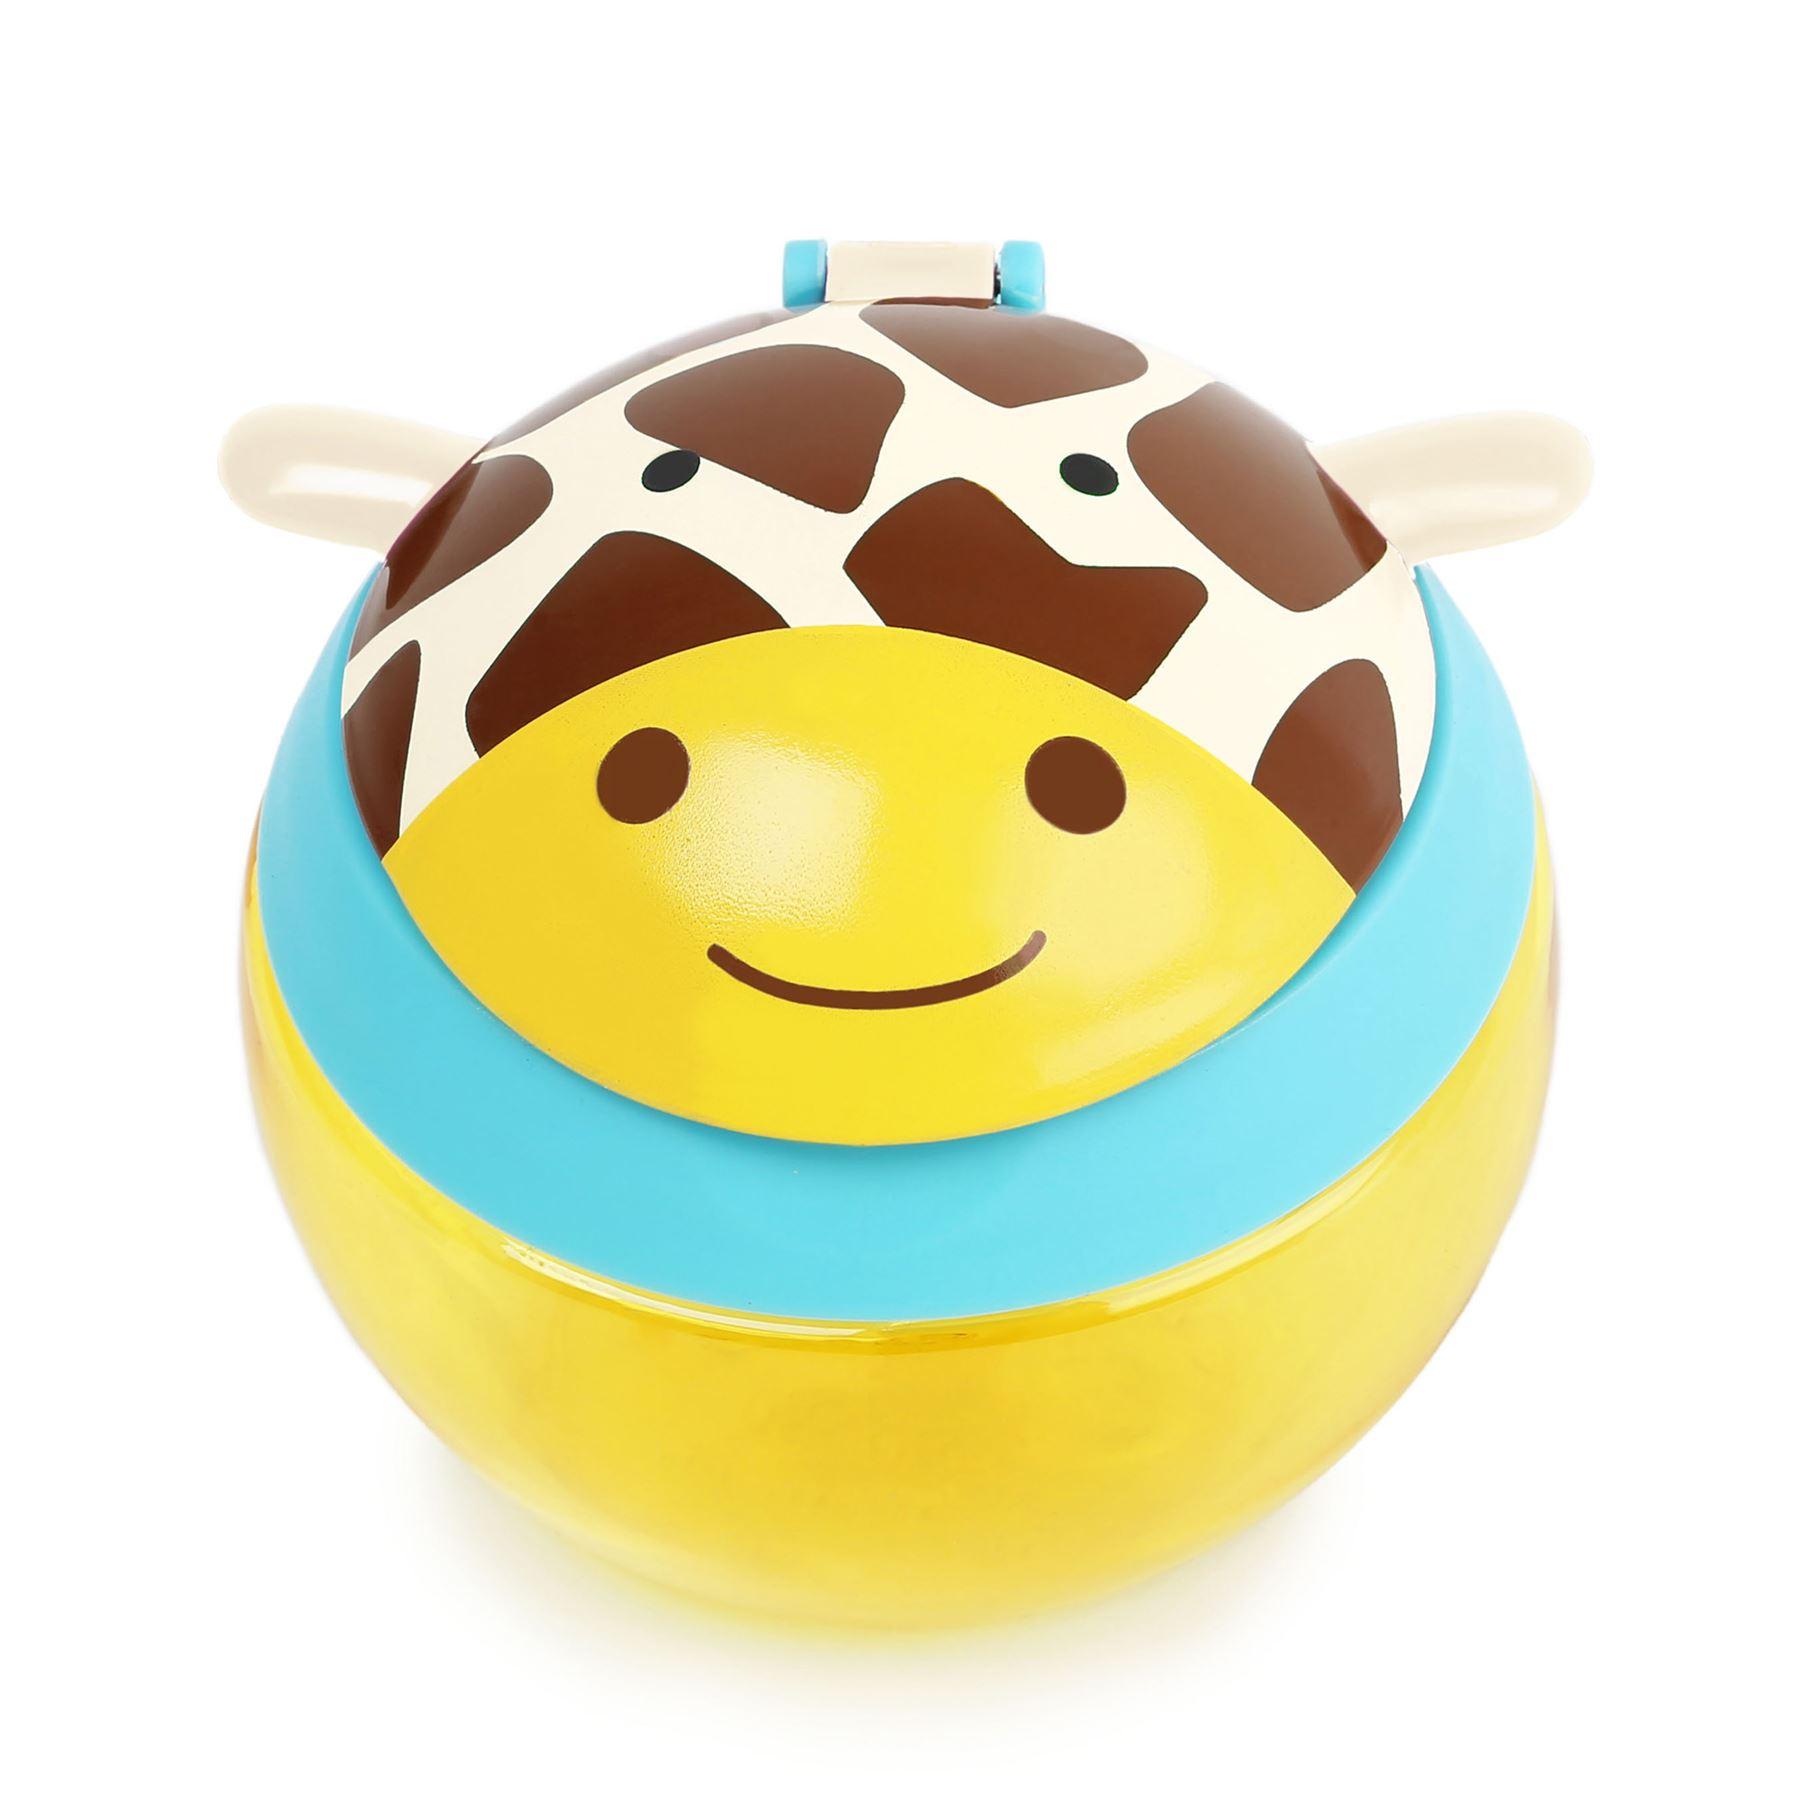 GIRAFFE Baby Feeding Cups Dishes Utensils BN Skip Hop ZOO SNACK CUP